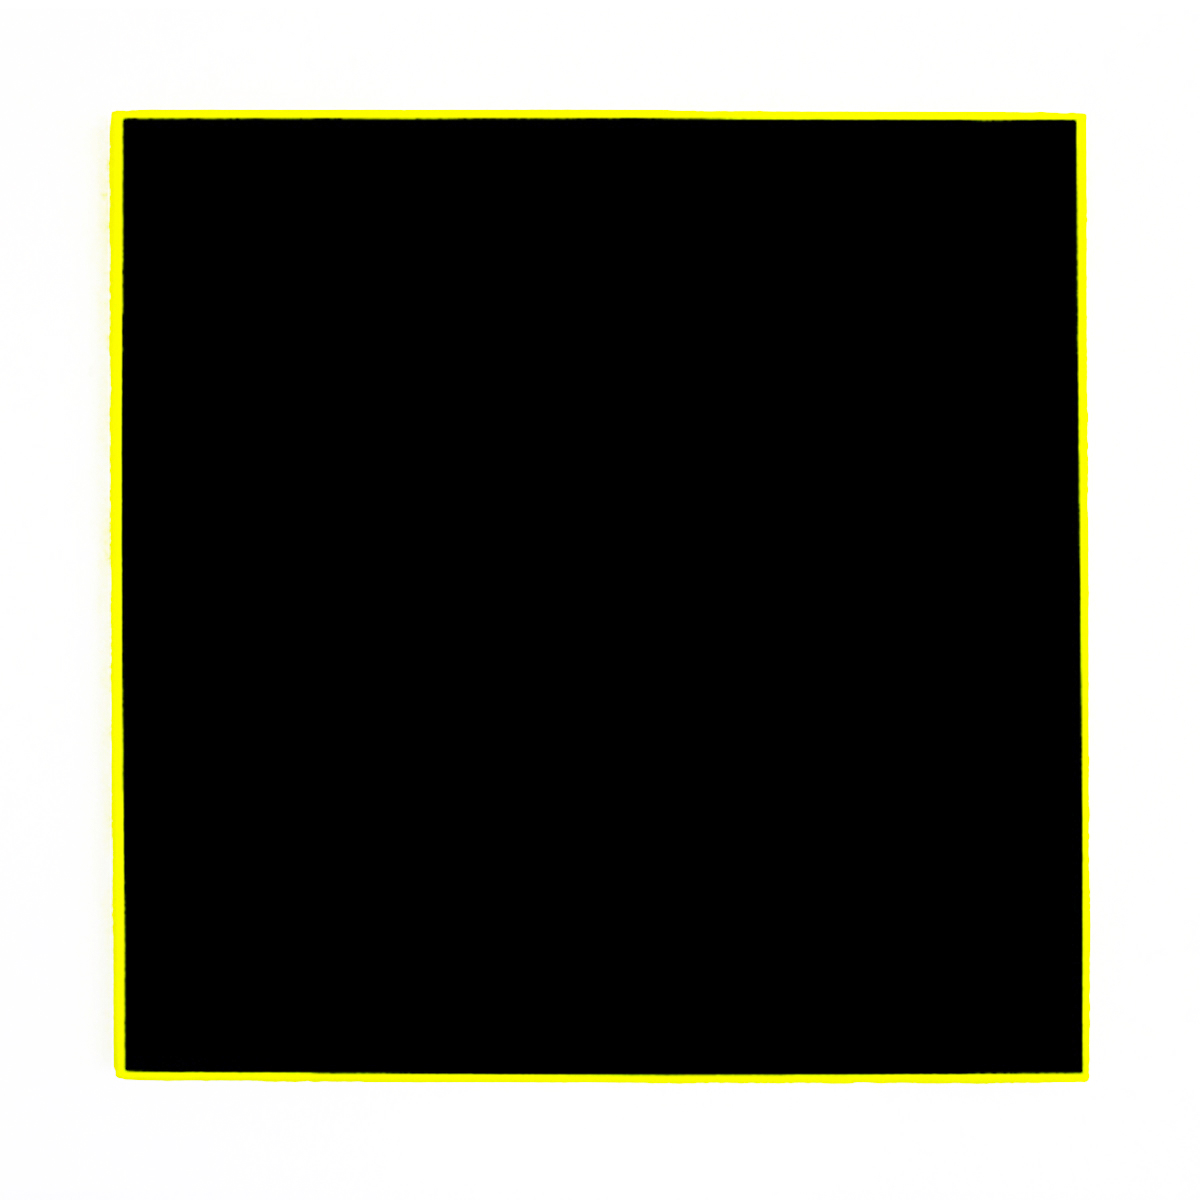 Peinture phosphorescente - E. jour